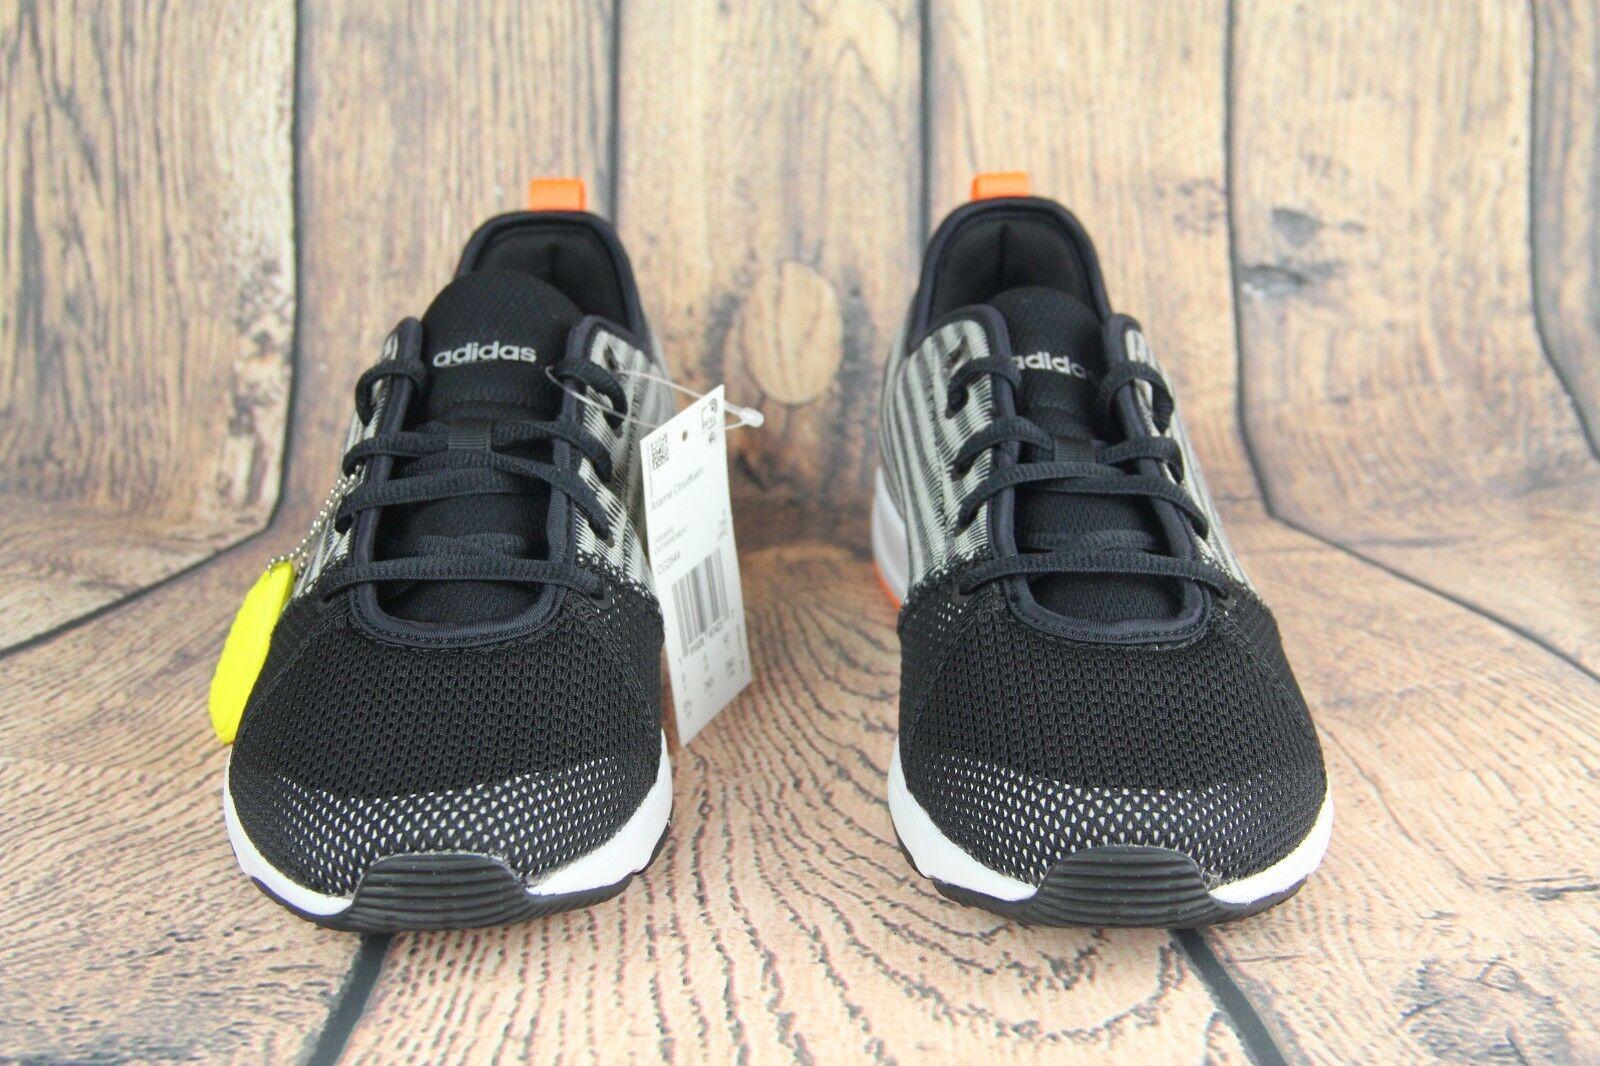 Adidas Arianna Cloudfoam Womens Training Shoes Black/Grey-Orange CG2844 SZ